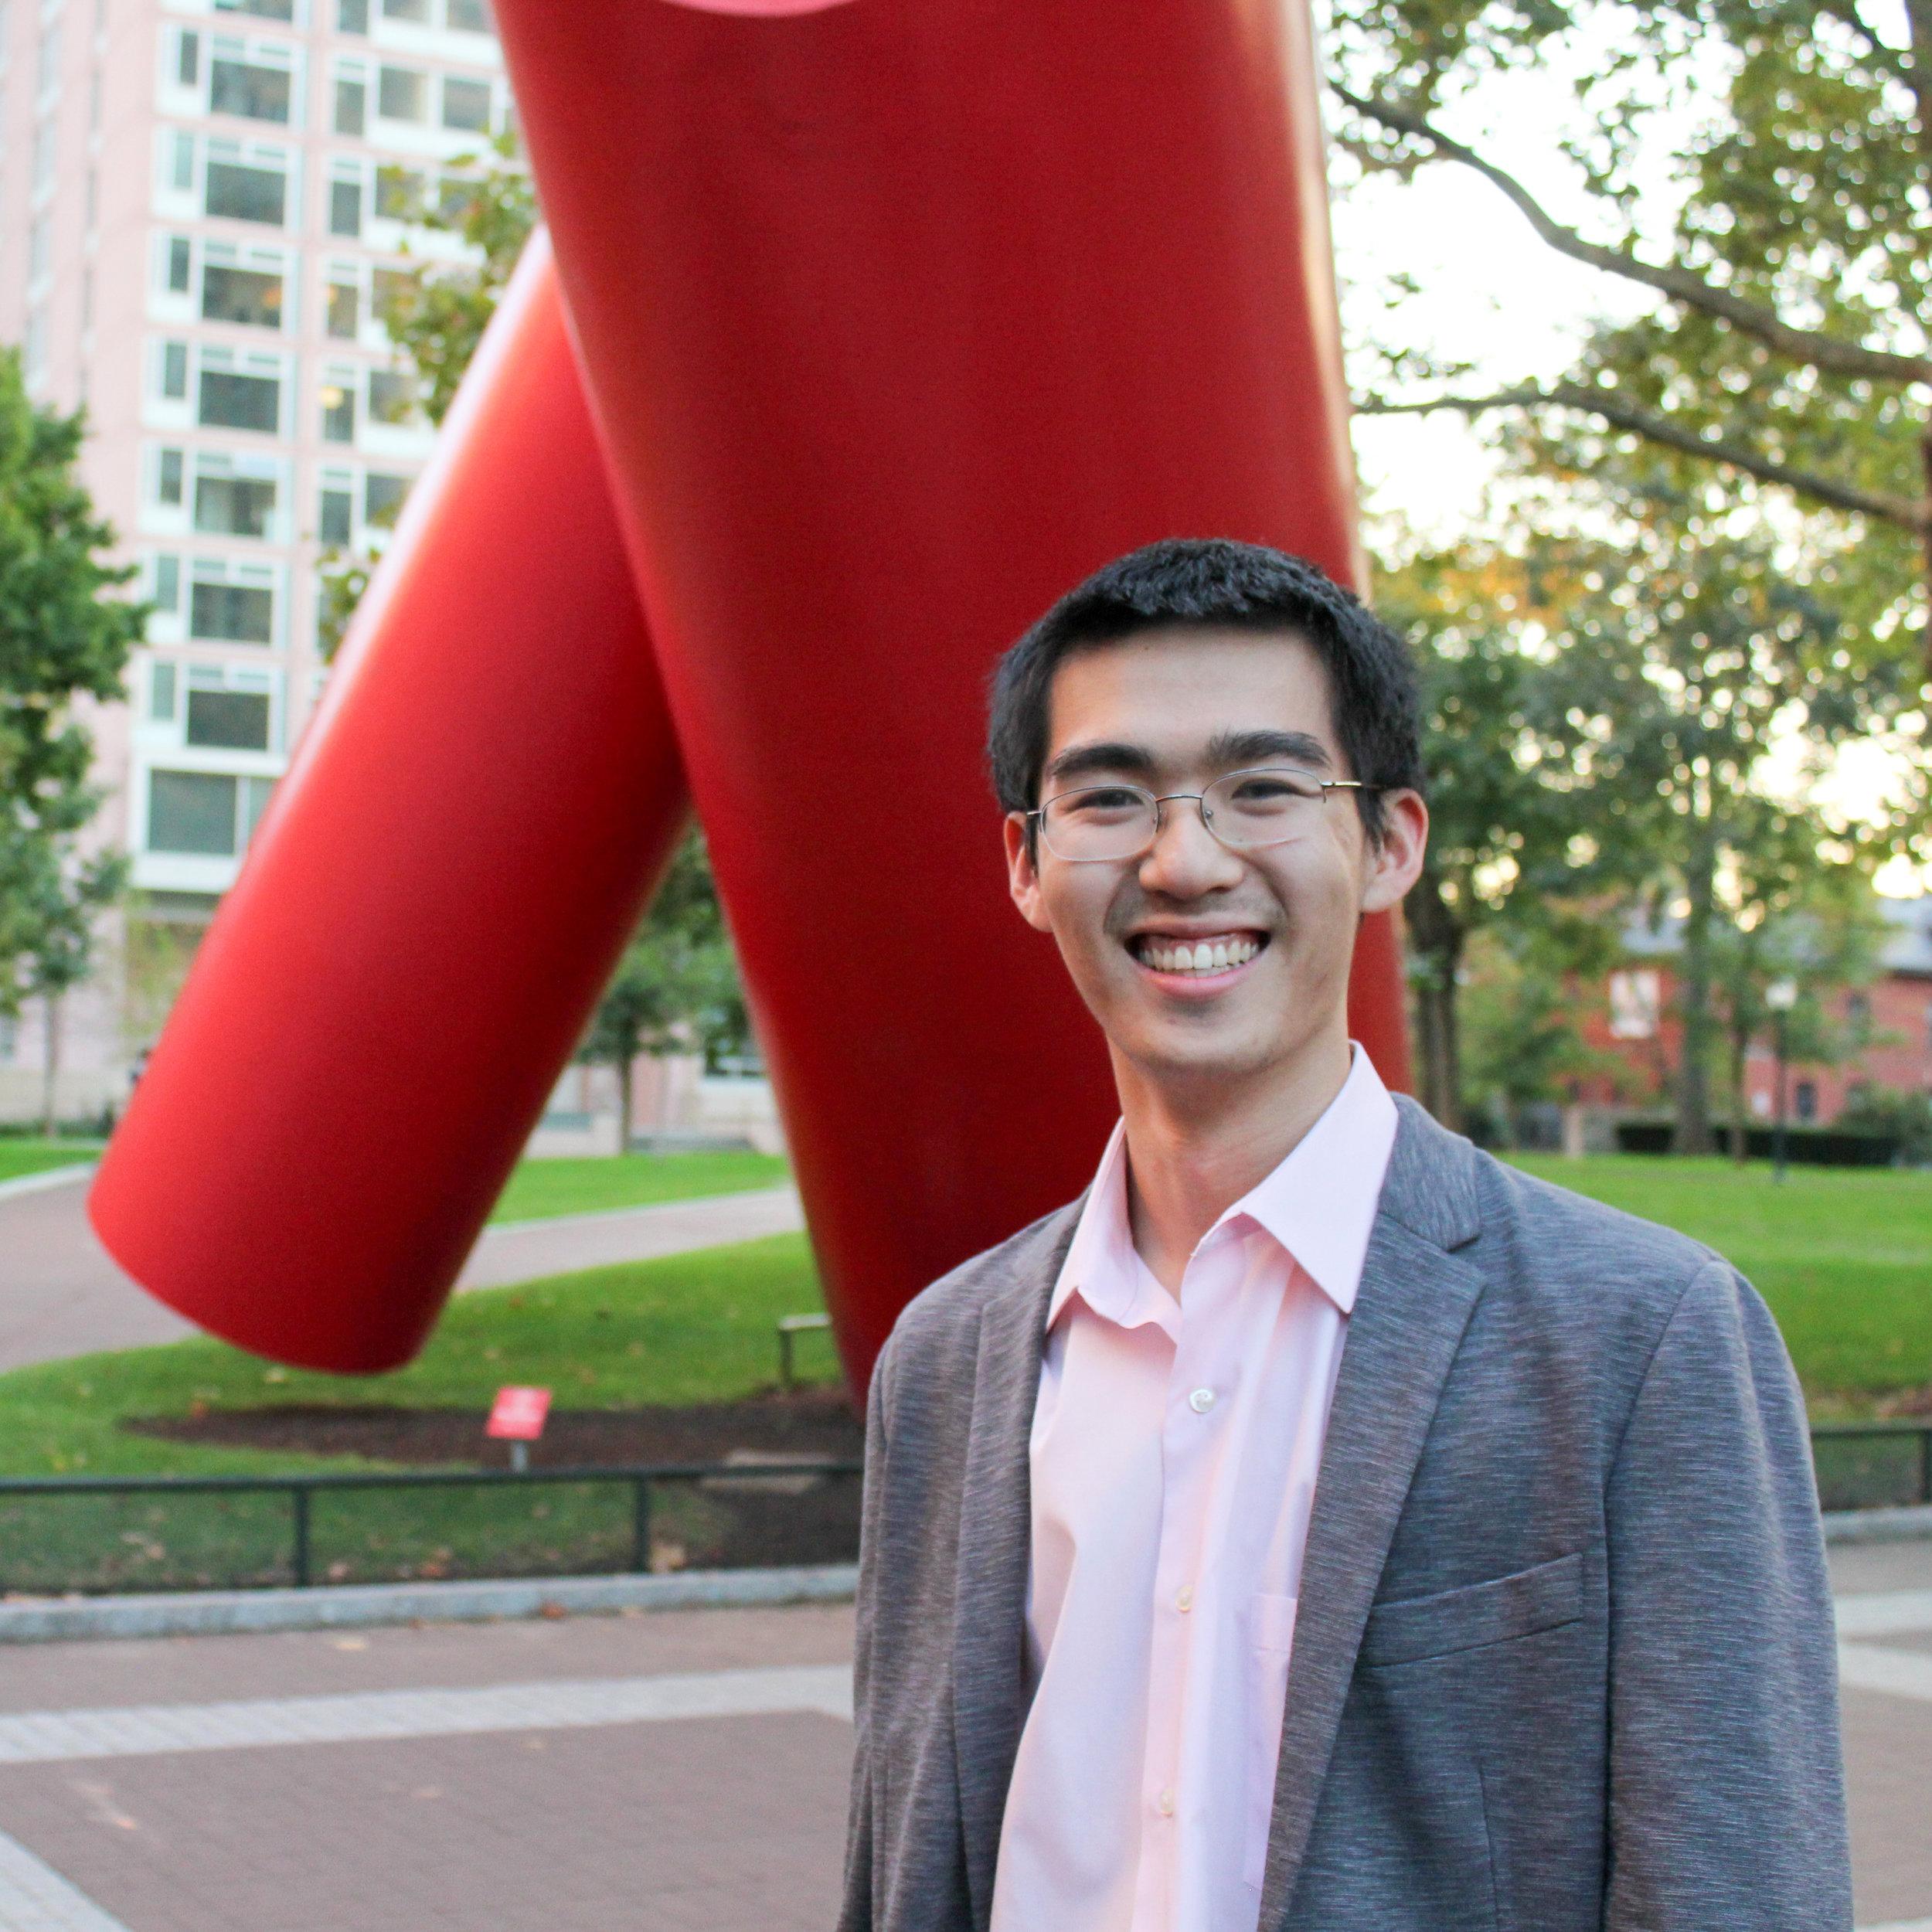 Derek Nong   Senior | Physics, Electrical Engineering | Director